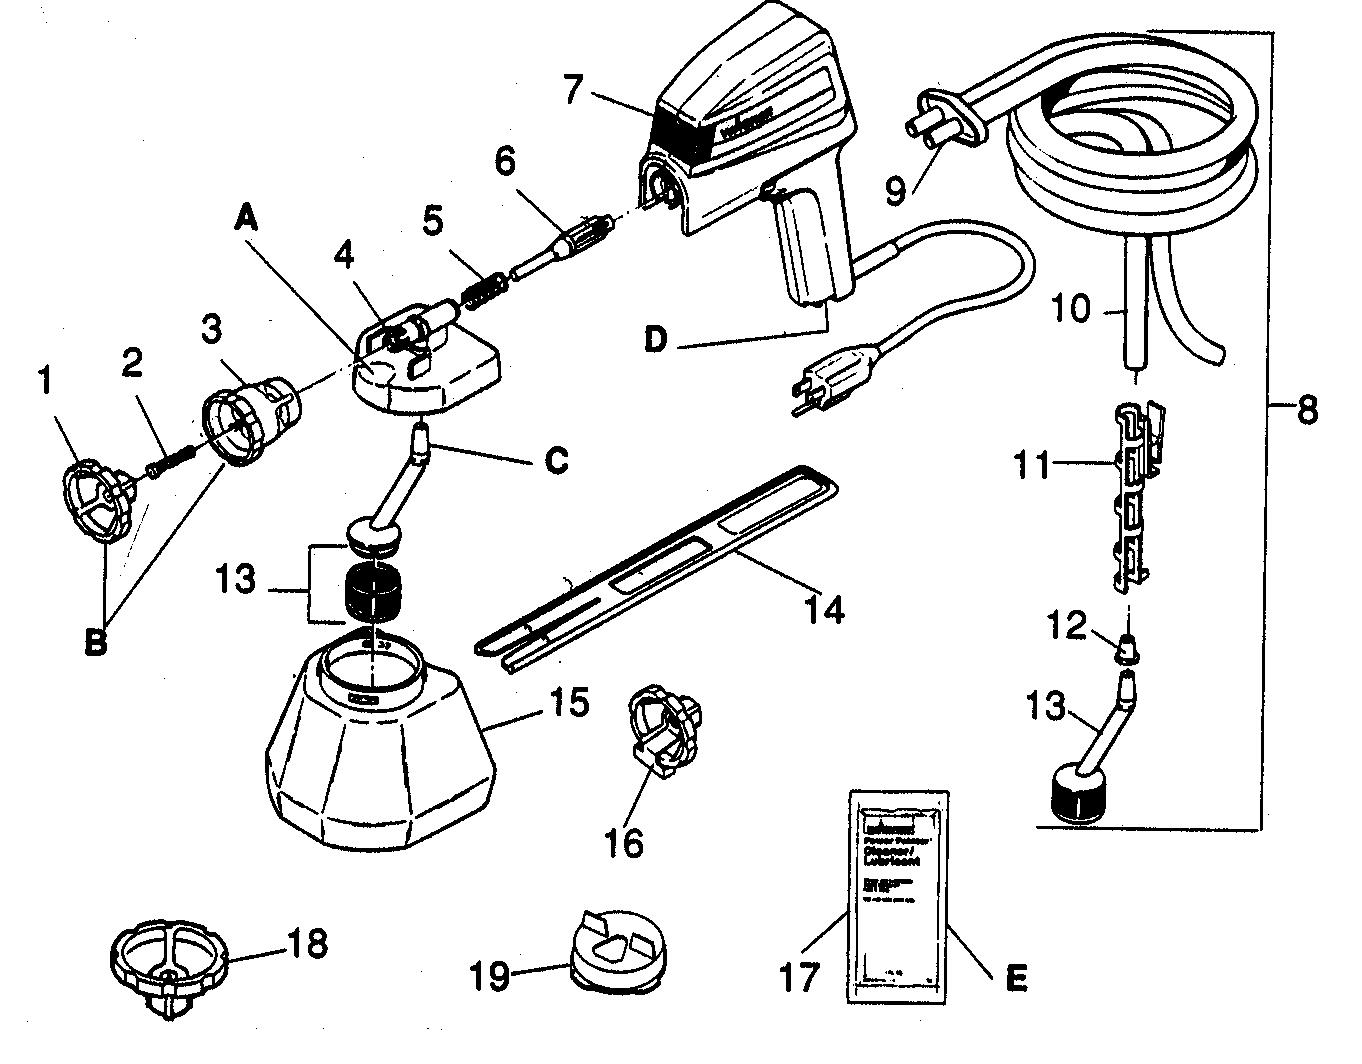 Wagner model 255 power sprayer genuine parts